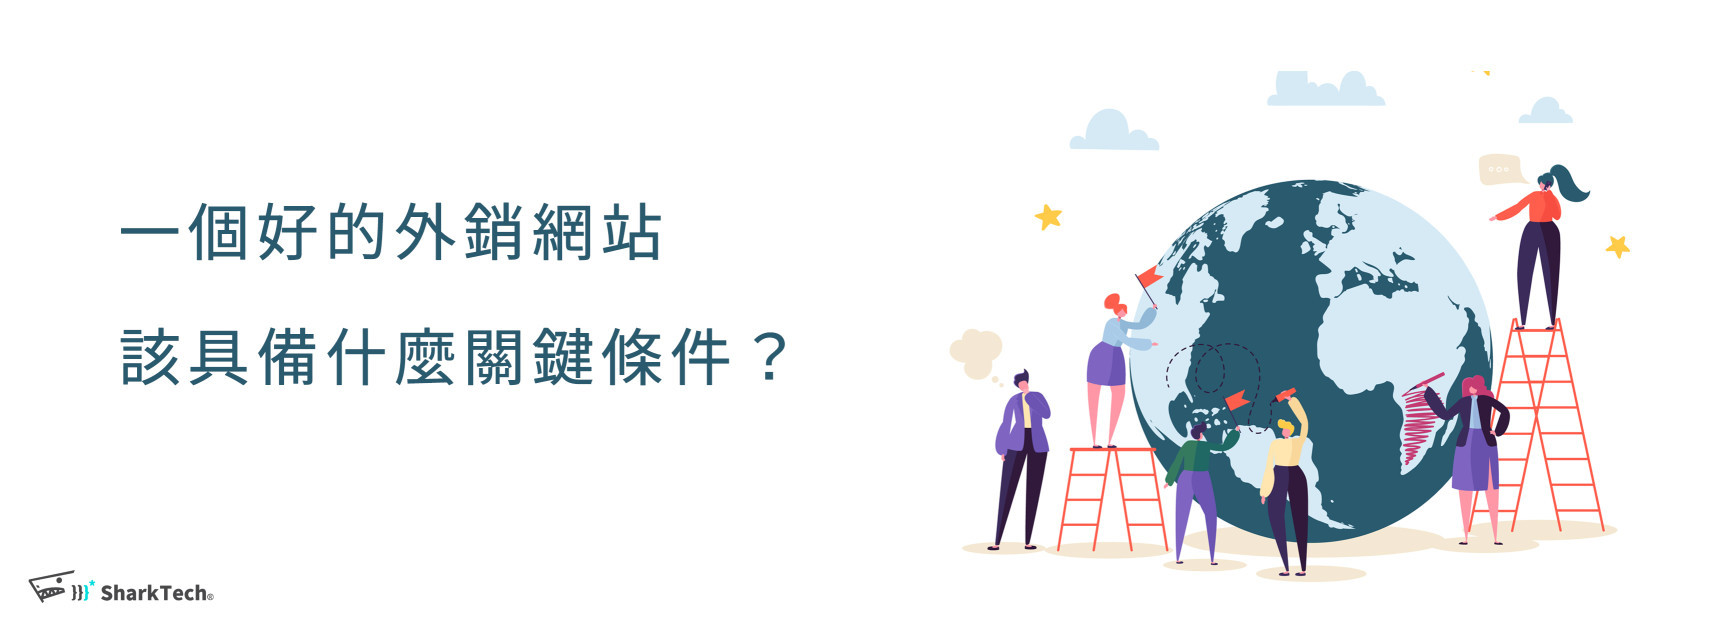 CDN快取服務改善B2B多國語言網站速度-外銷網站設計條件|鯊客科技SEO網站設計公司